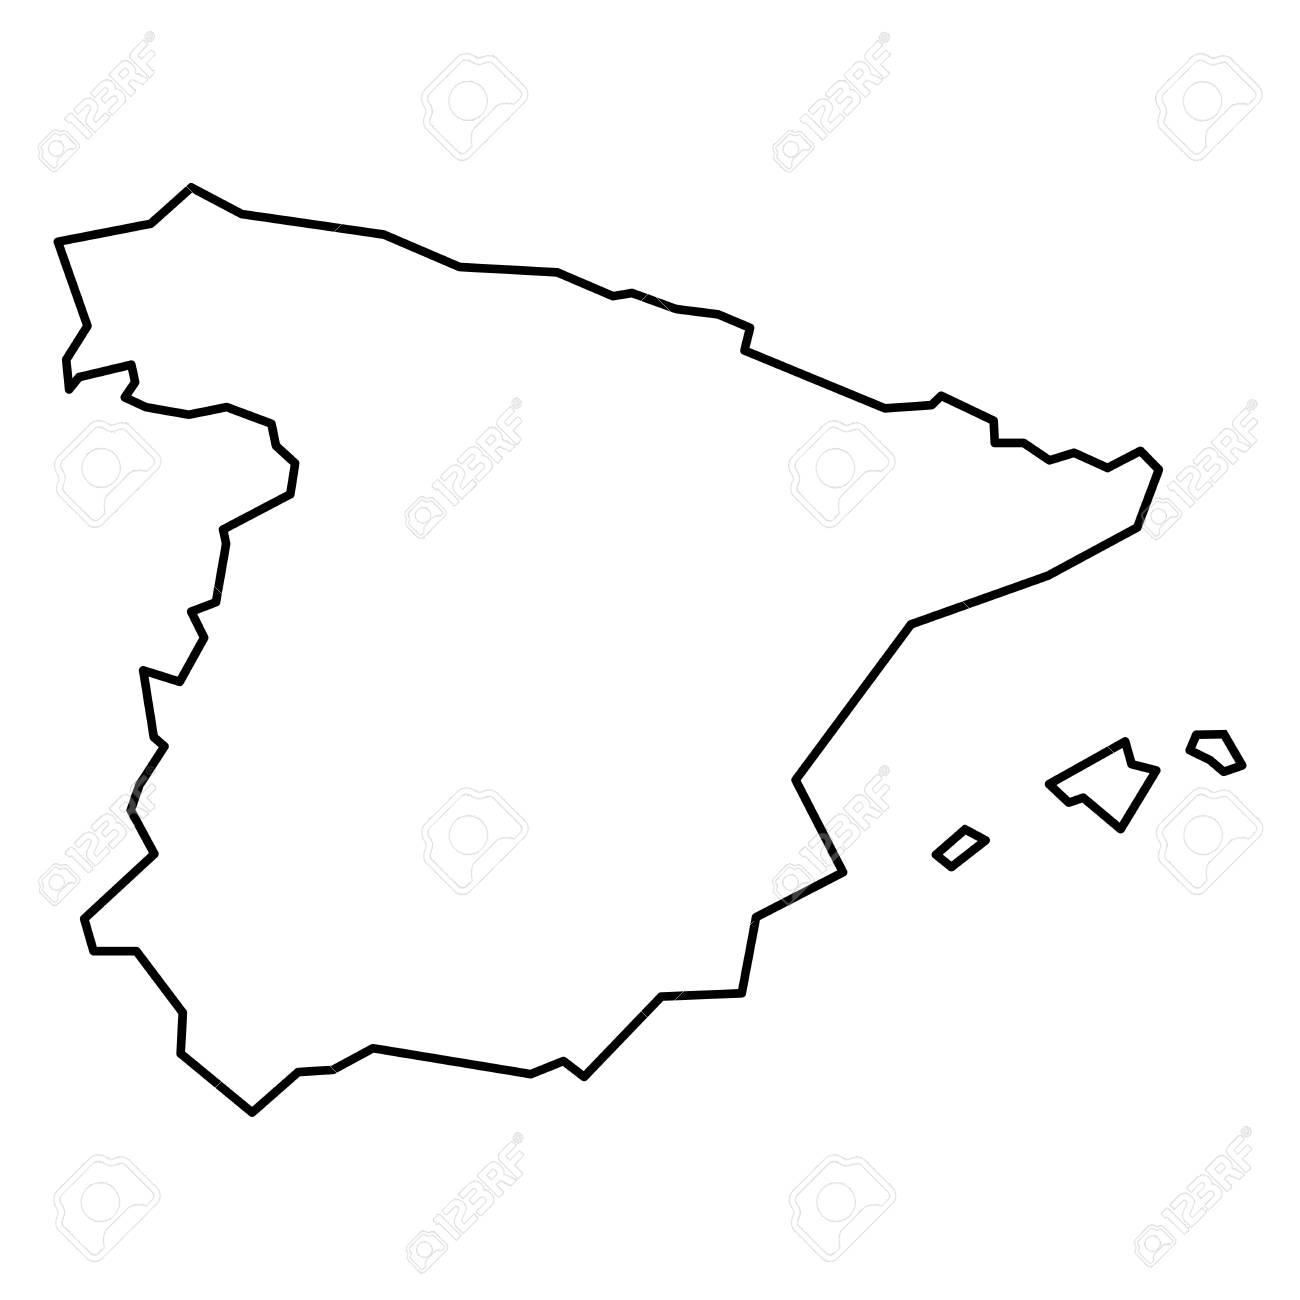 Carte Espagne Noir Et Blanc.Carte De Contour Simple De L Espagne Carte De Contour Noir Isole Sur Fond Blanc